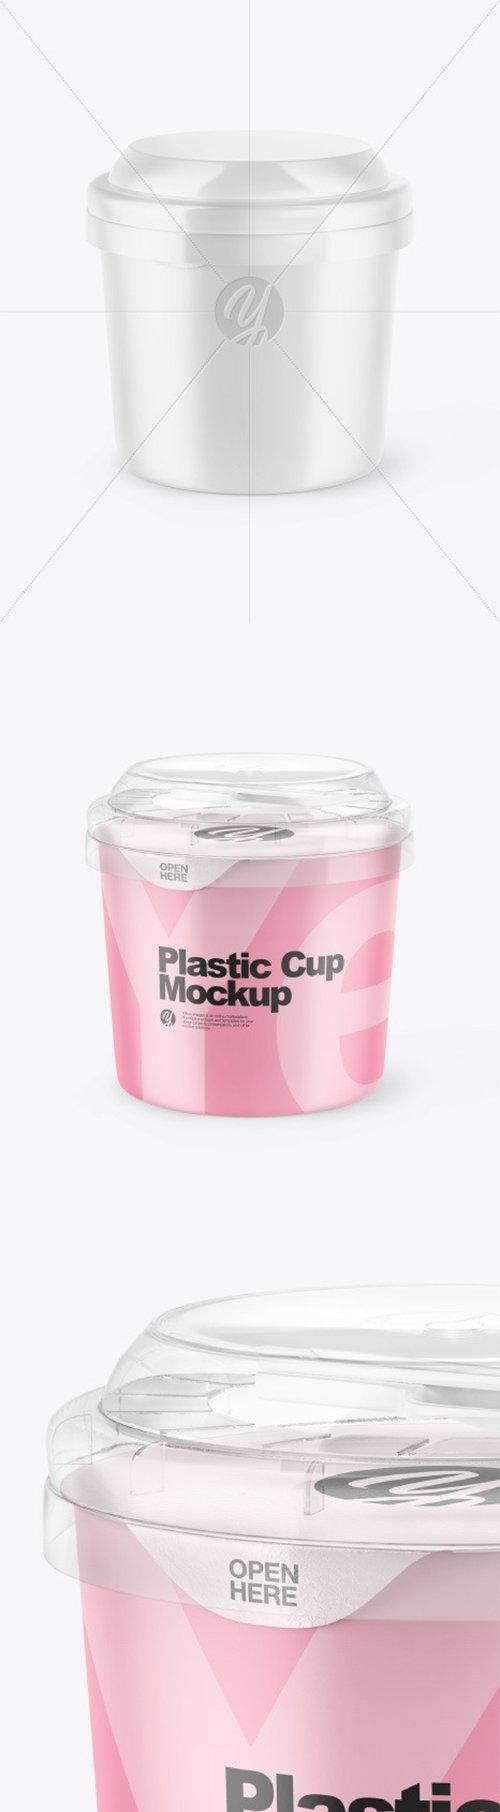 Matte Plastic Cup Mockup 66430